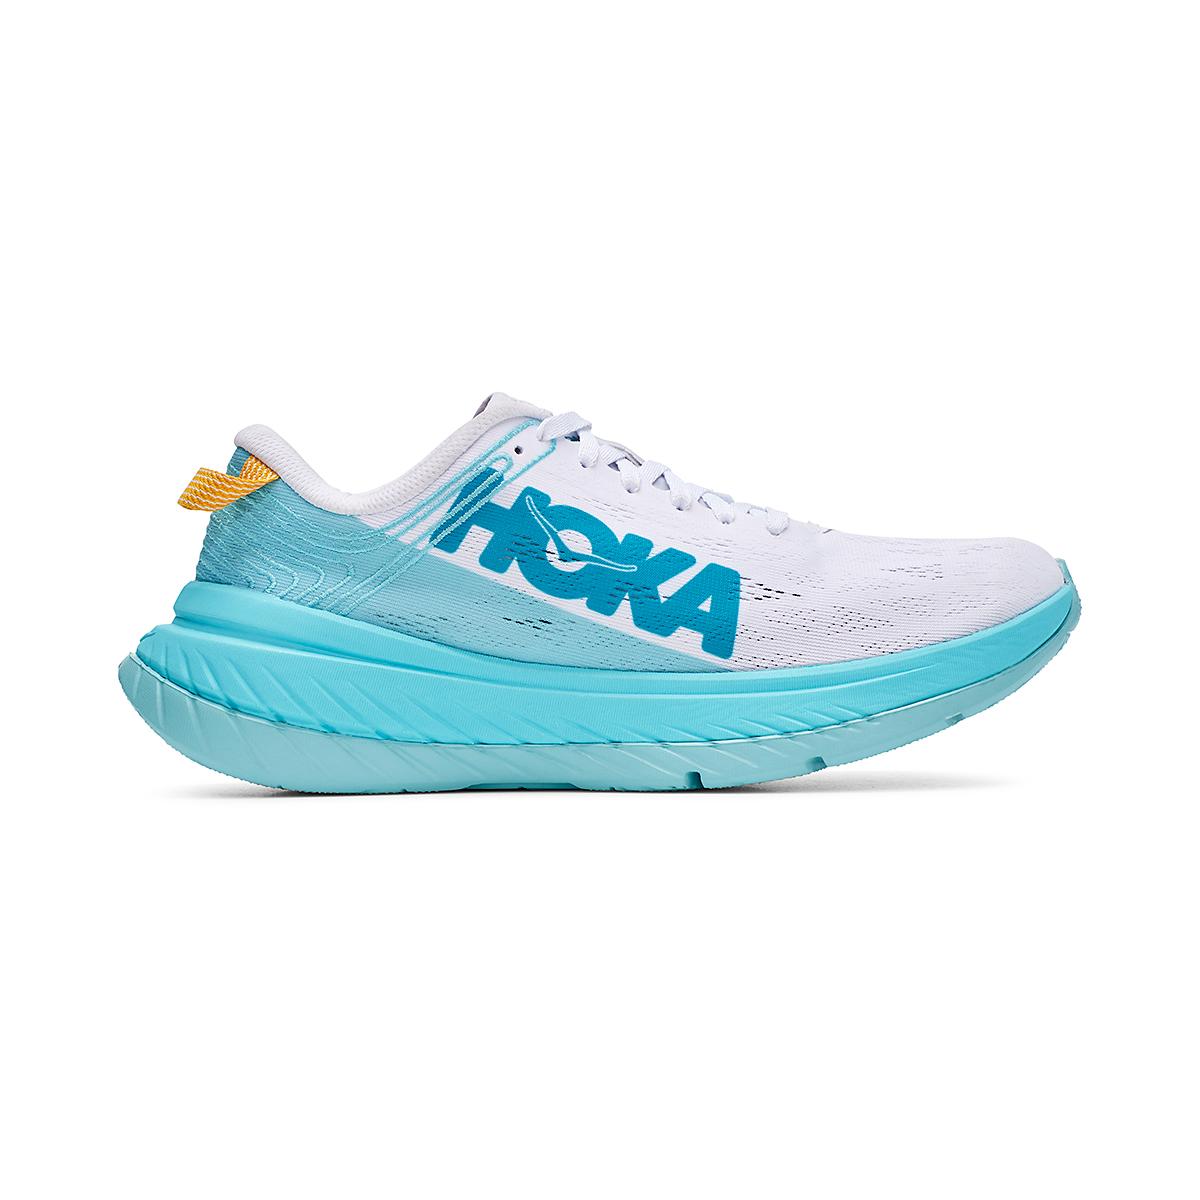 Women's Hoka One One Carbon X Running Shoe - Color: White/Angel Blue - Size: 5 - Width: Regular, White/Angel Blue, large, image 1